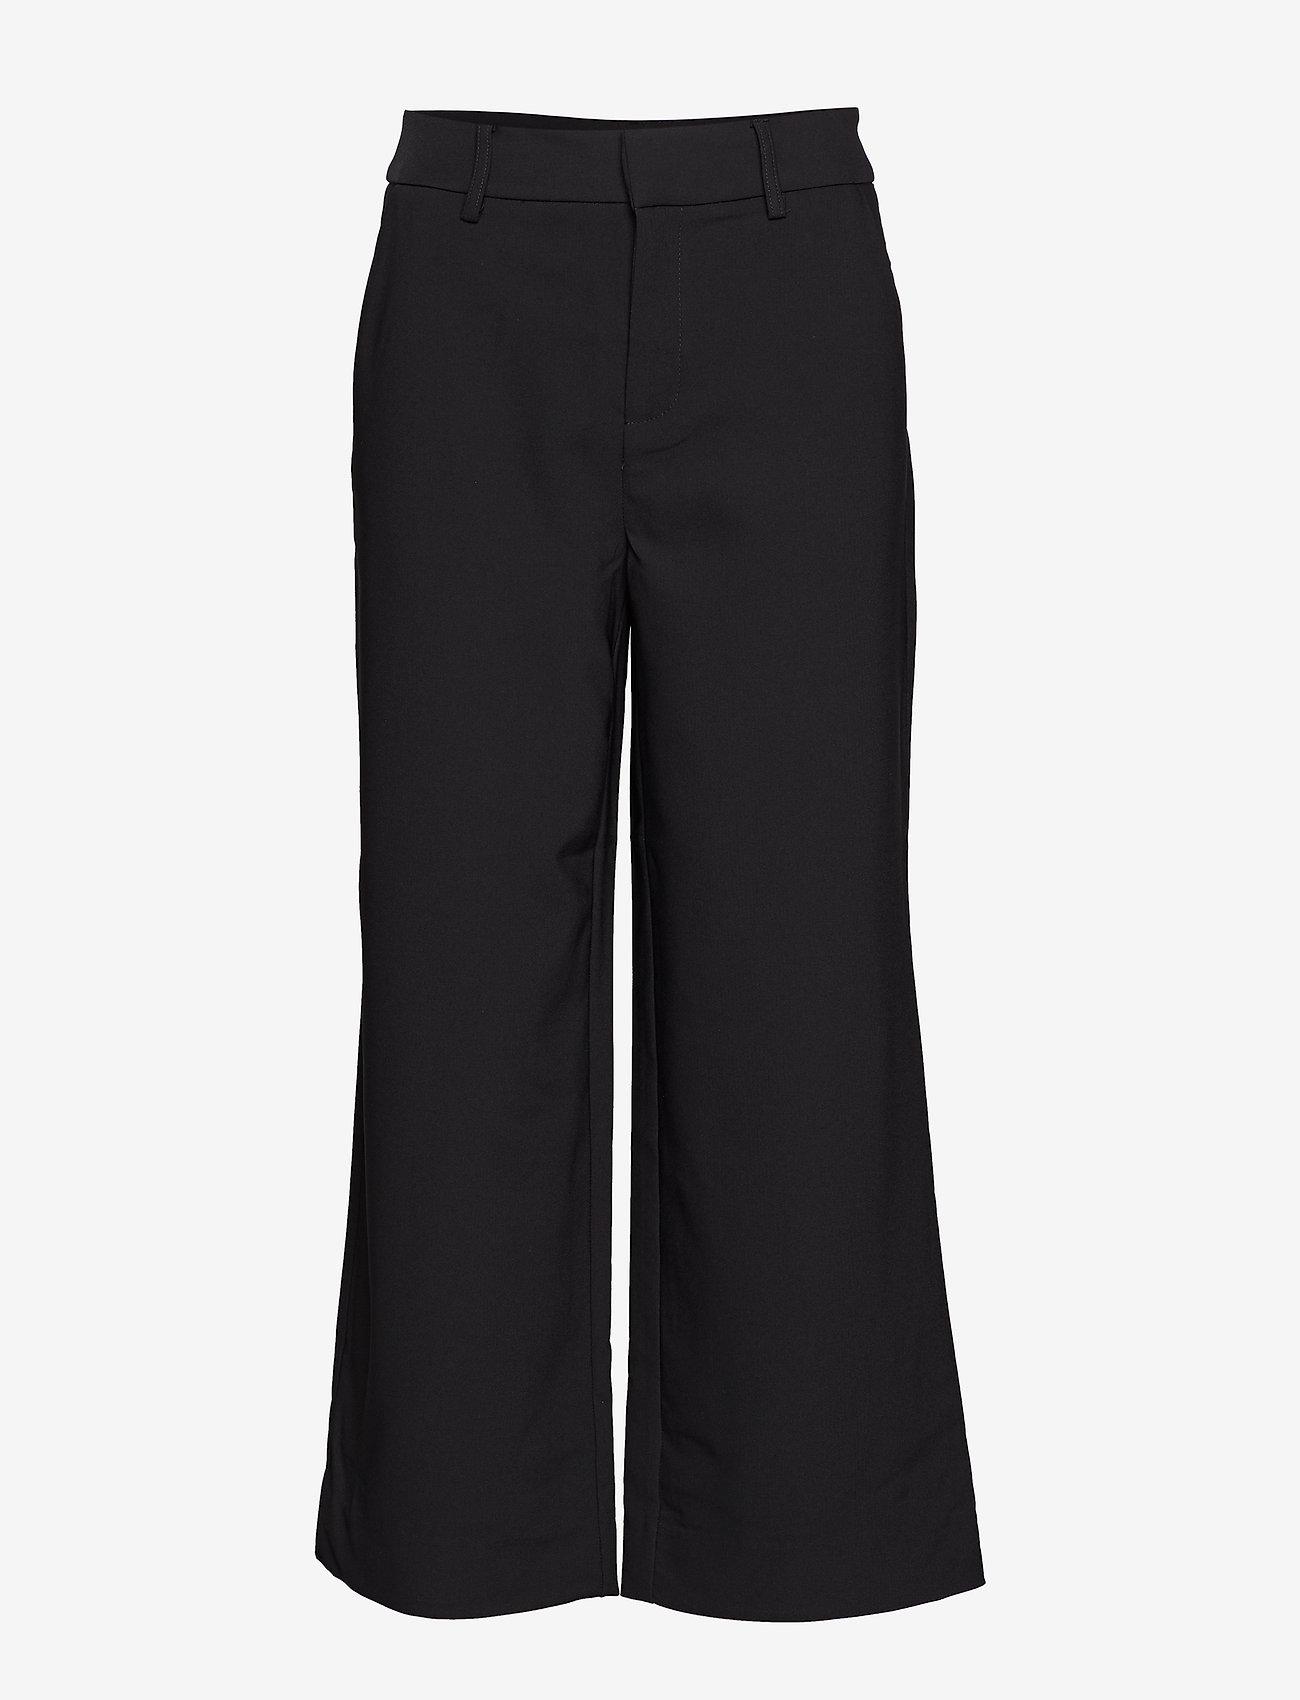 Gestuz - JoelleGZ culotte NOOS - bukser med brede ben - black - 1